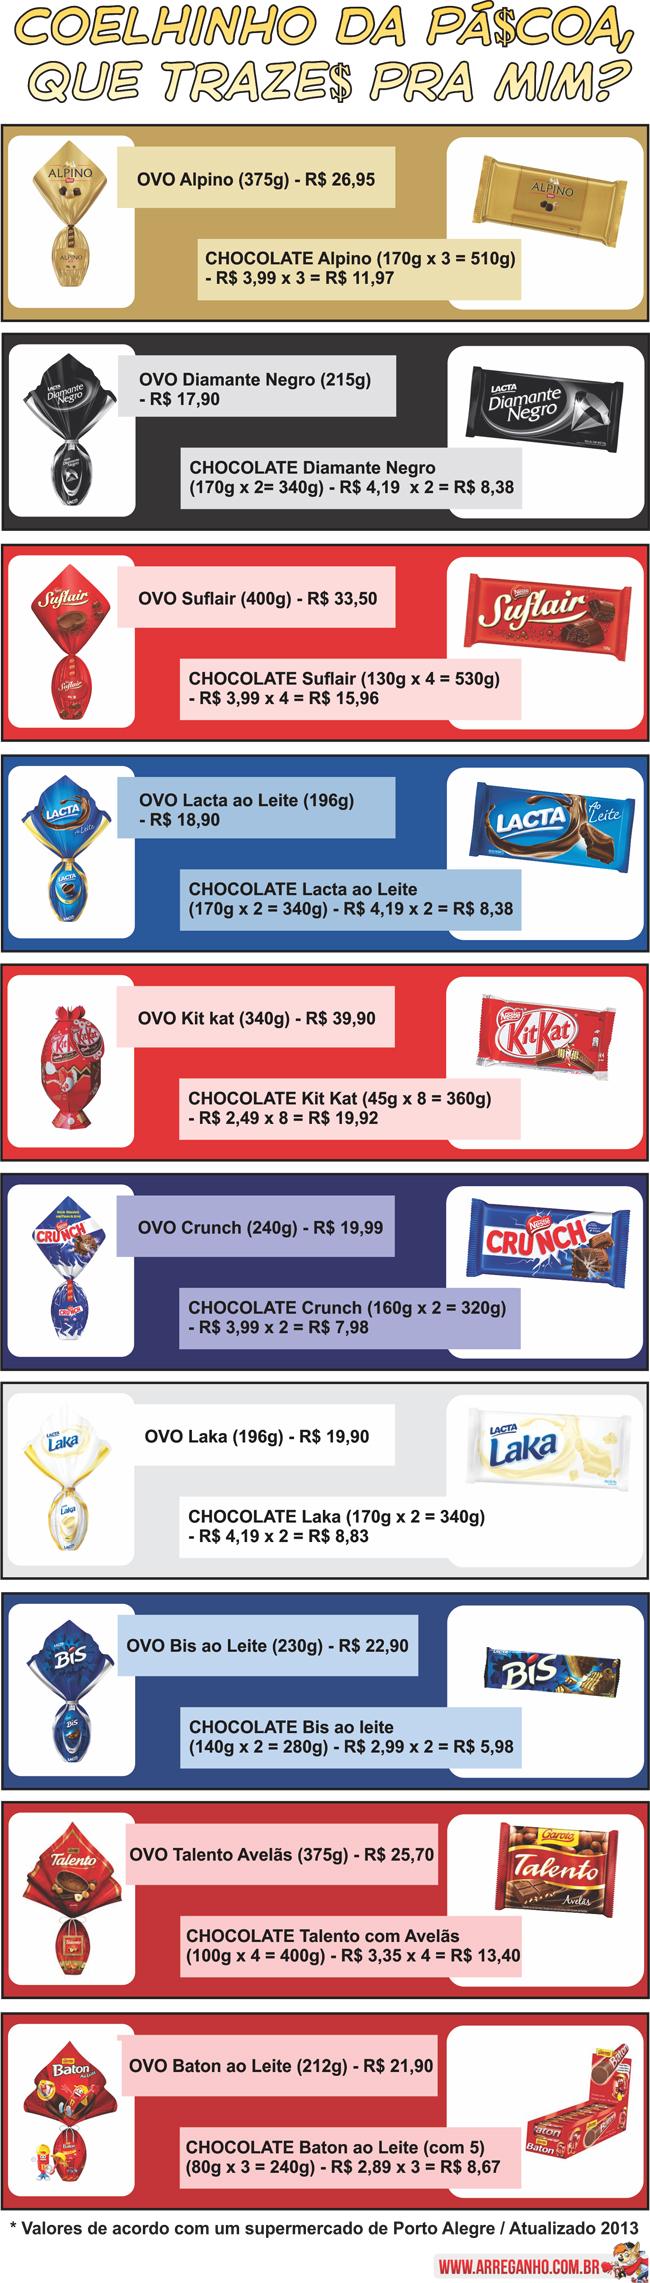 Tabela de valores de Ovos e Barras de Chocolates de Páscoa